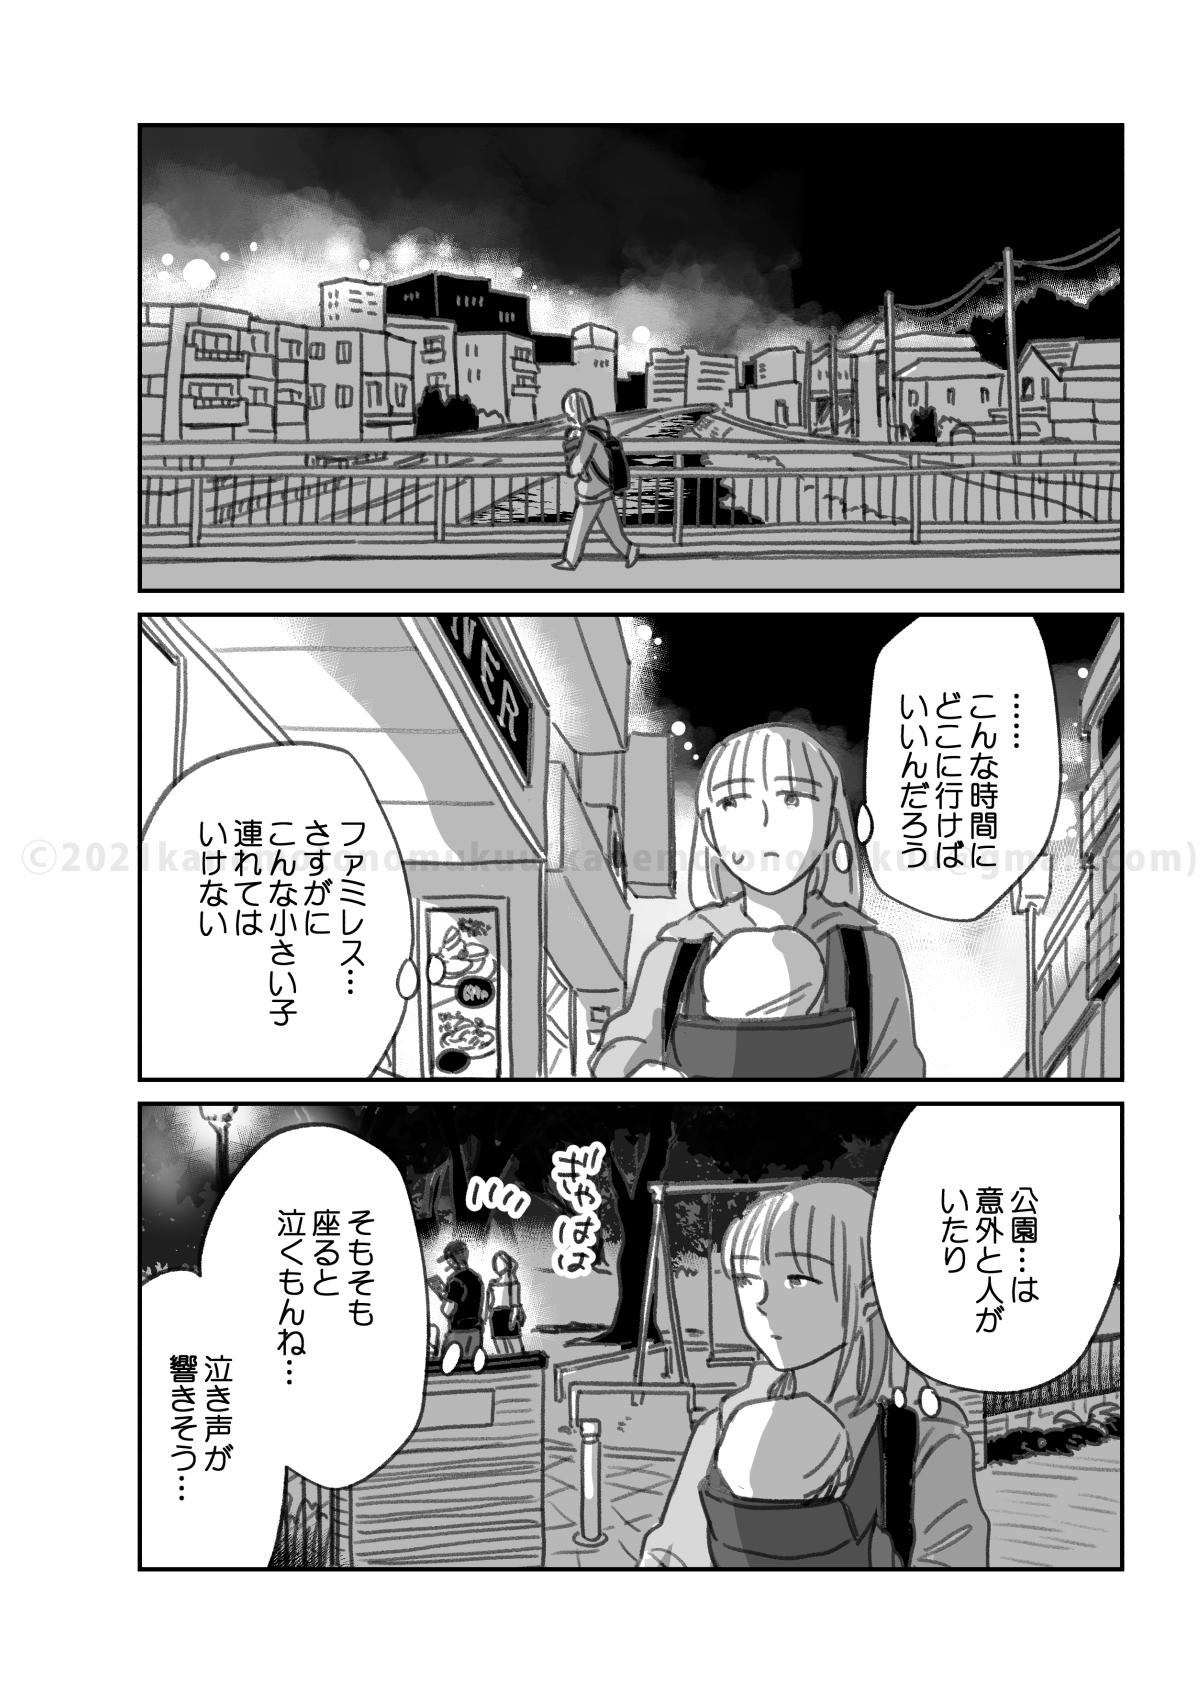 f:id:kanemotonomukuu:20210319175004j:plain